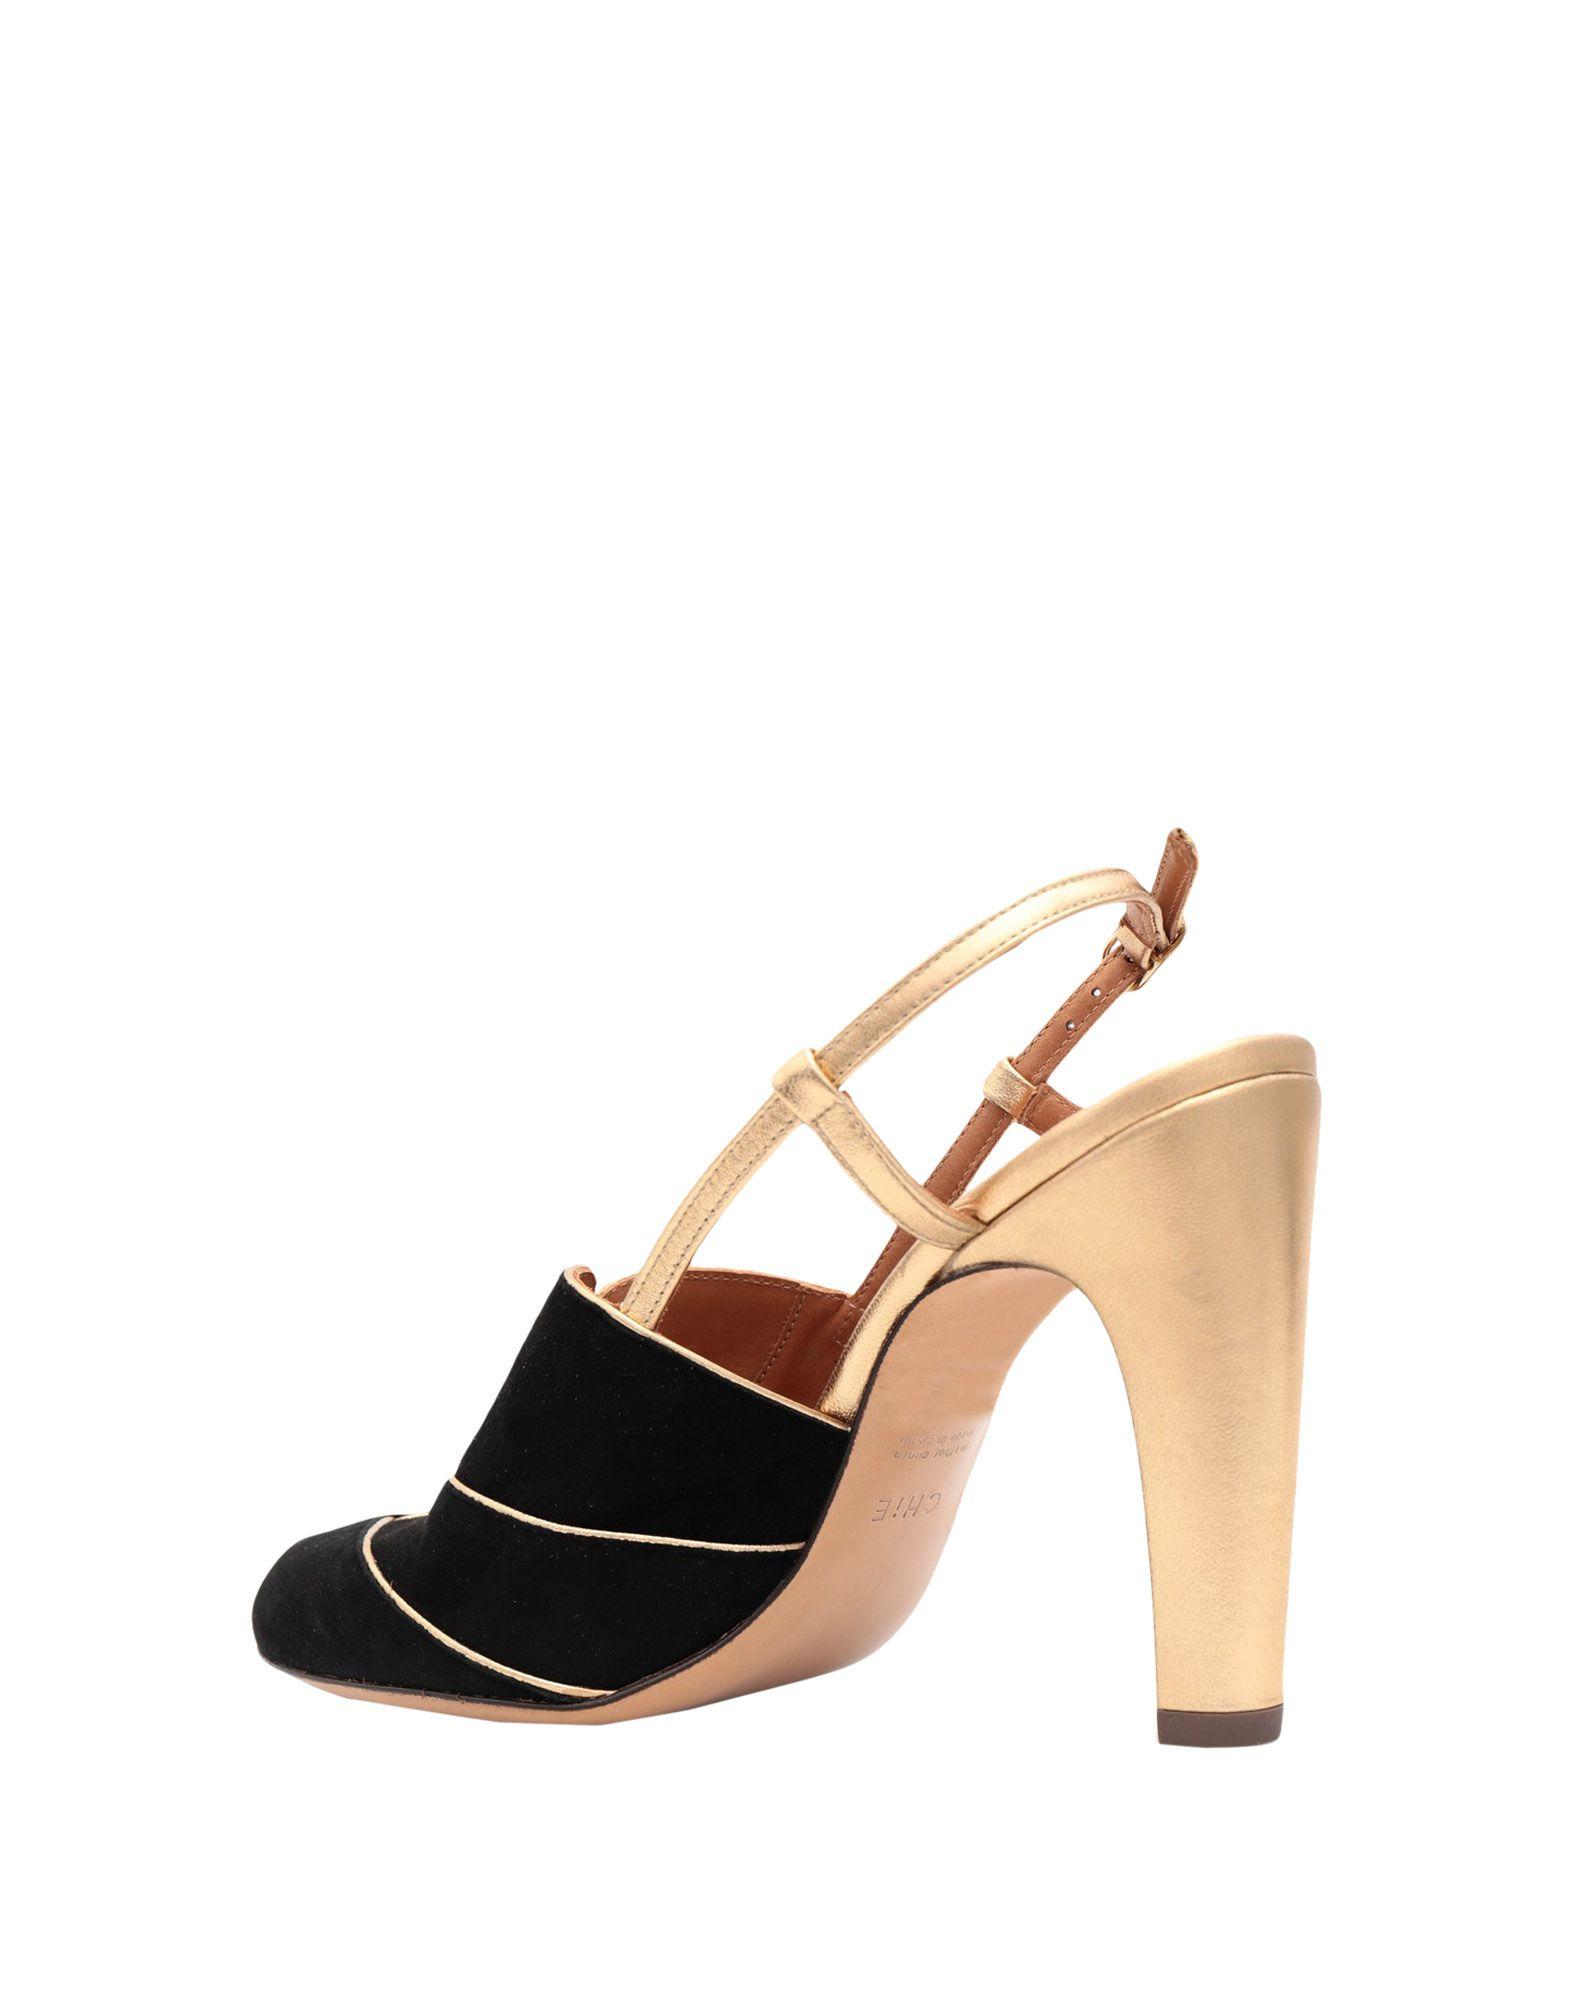 Rabatt Schuhe Chie Damen By Chie Mihara Pumps Damen Chie  11549063FR 5e1239